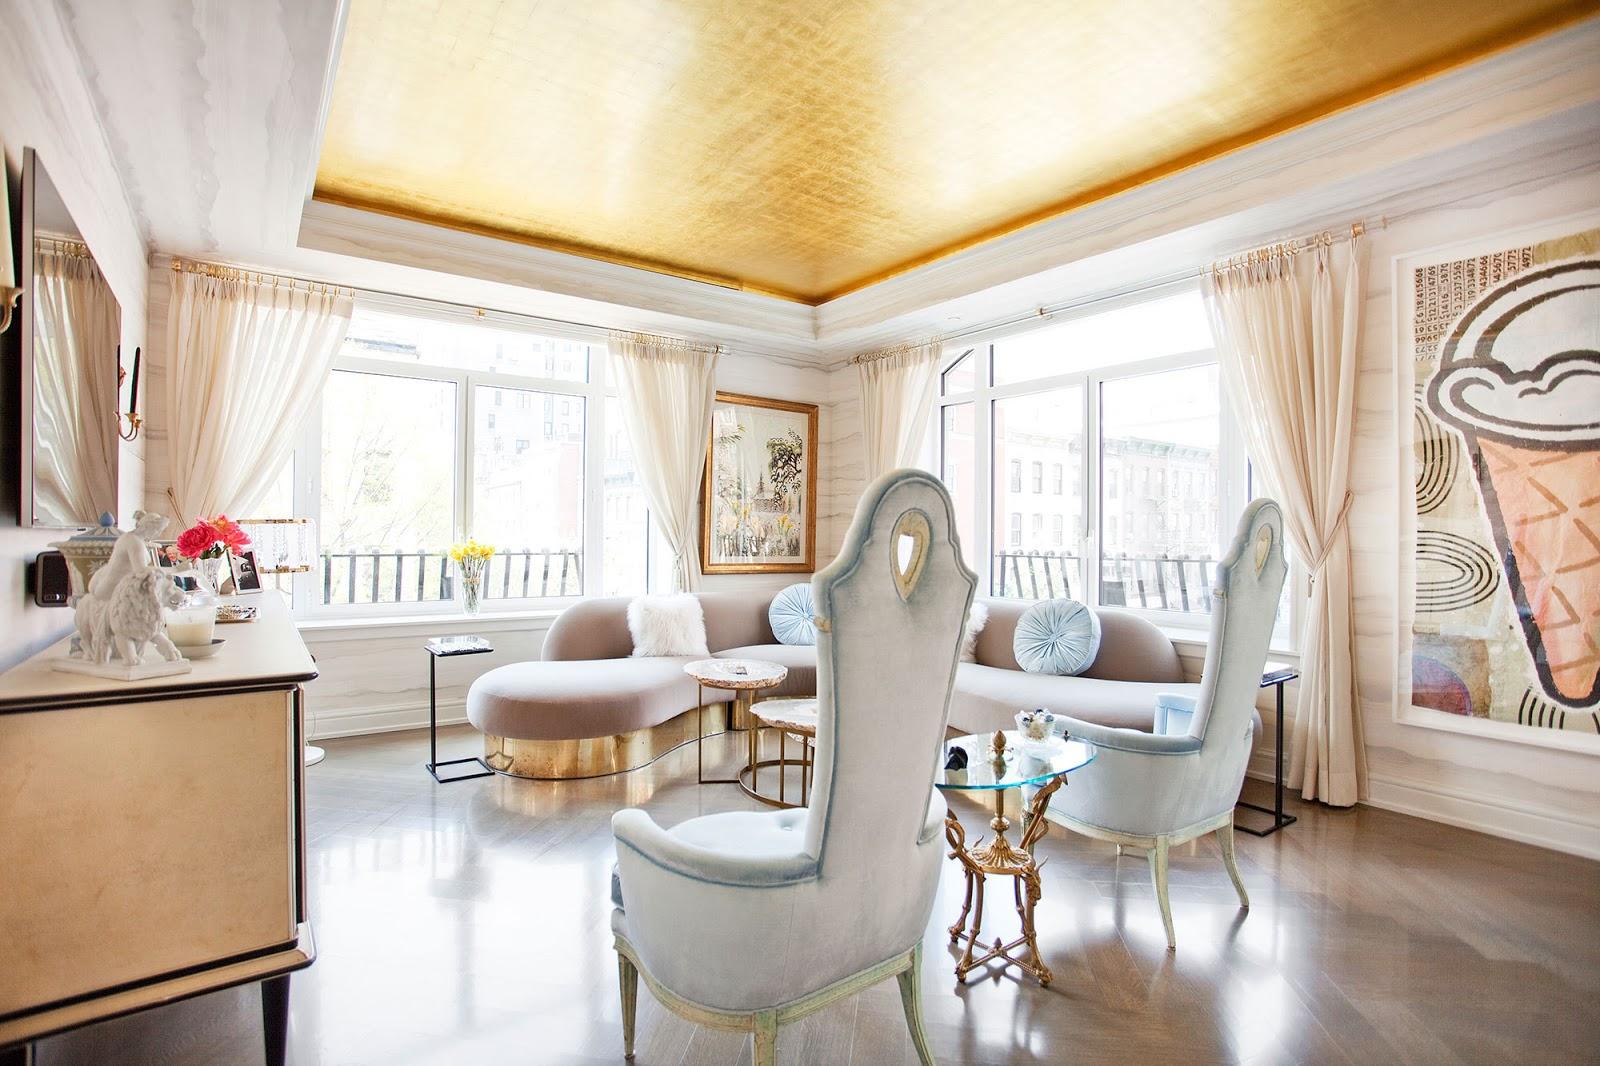 Decor inspiration interior designer sasha bikoff new for Interior design new york style